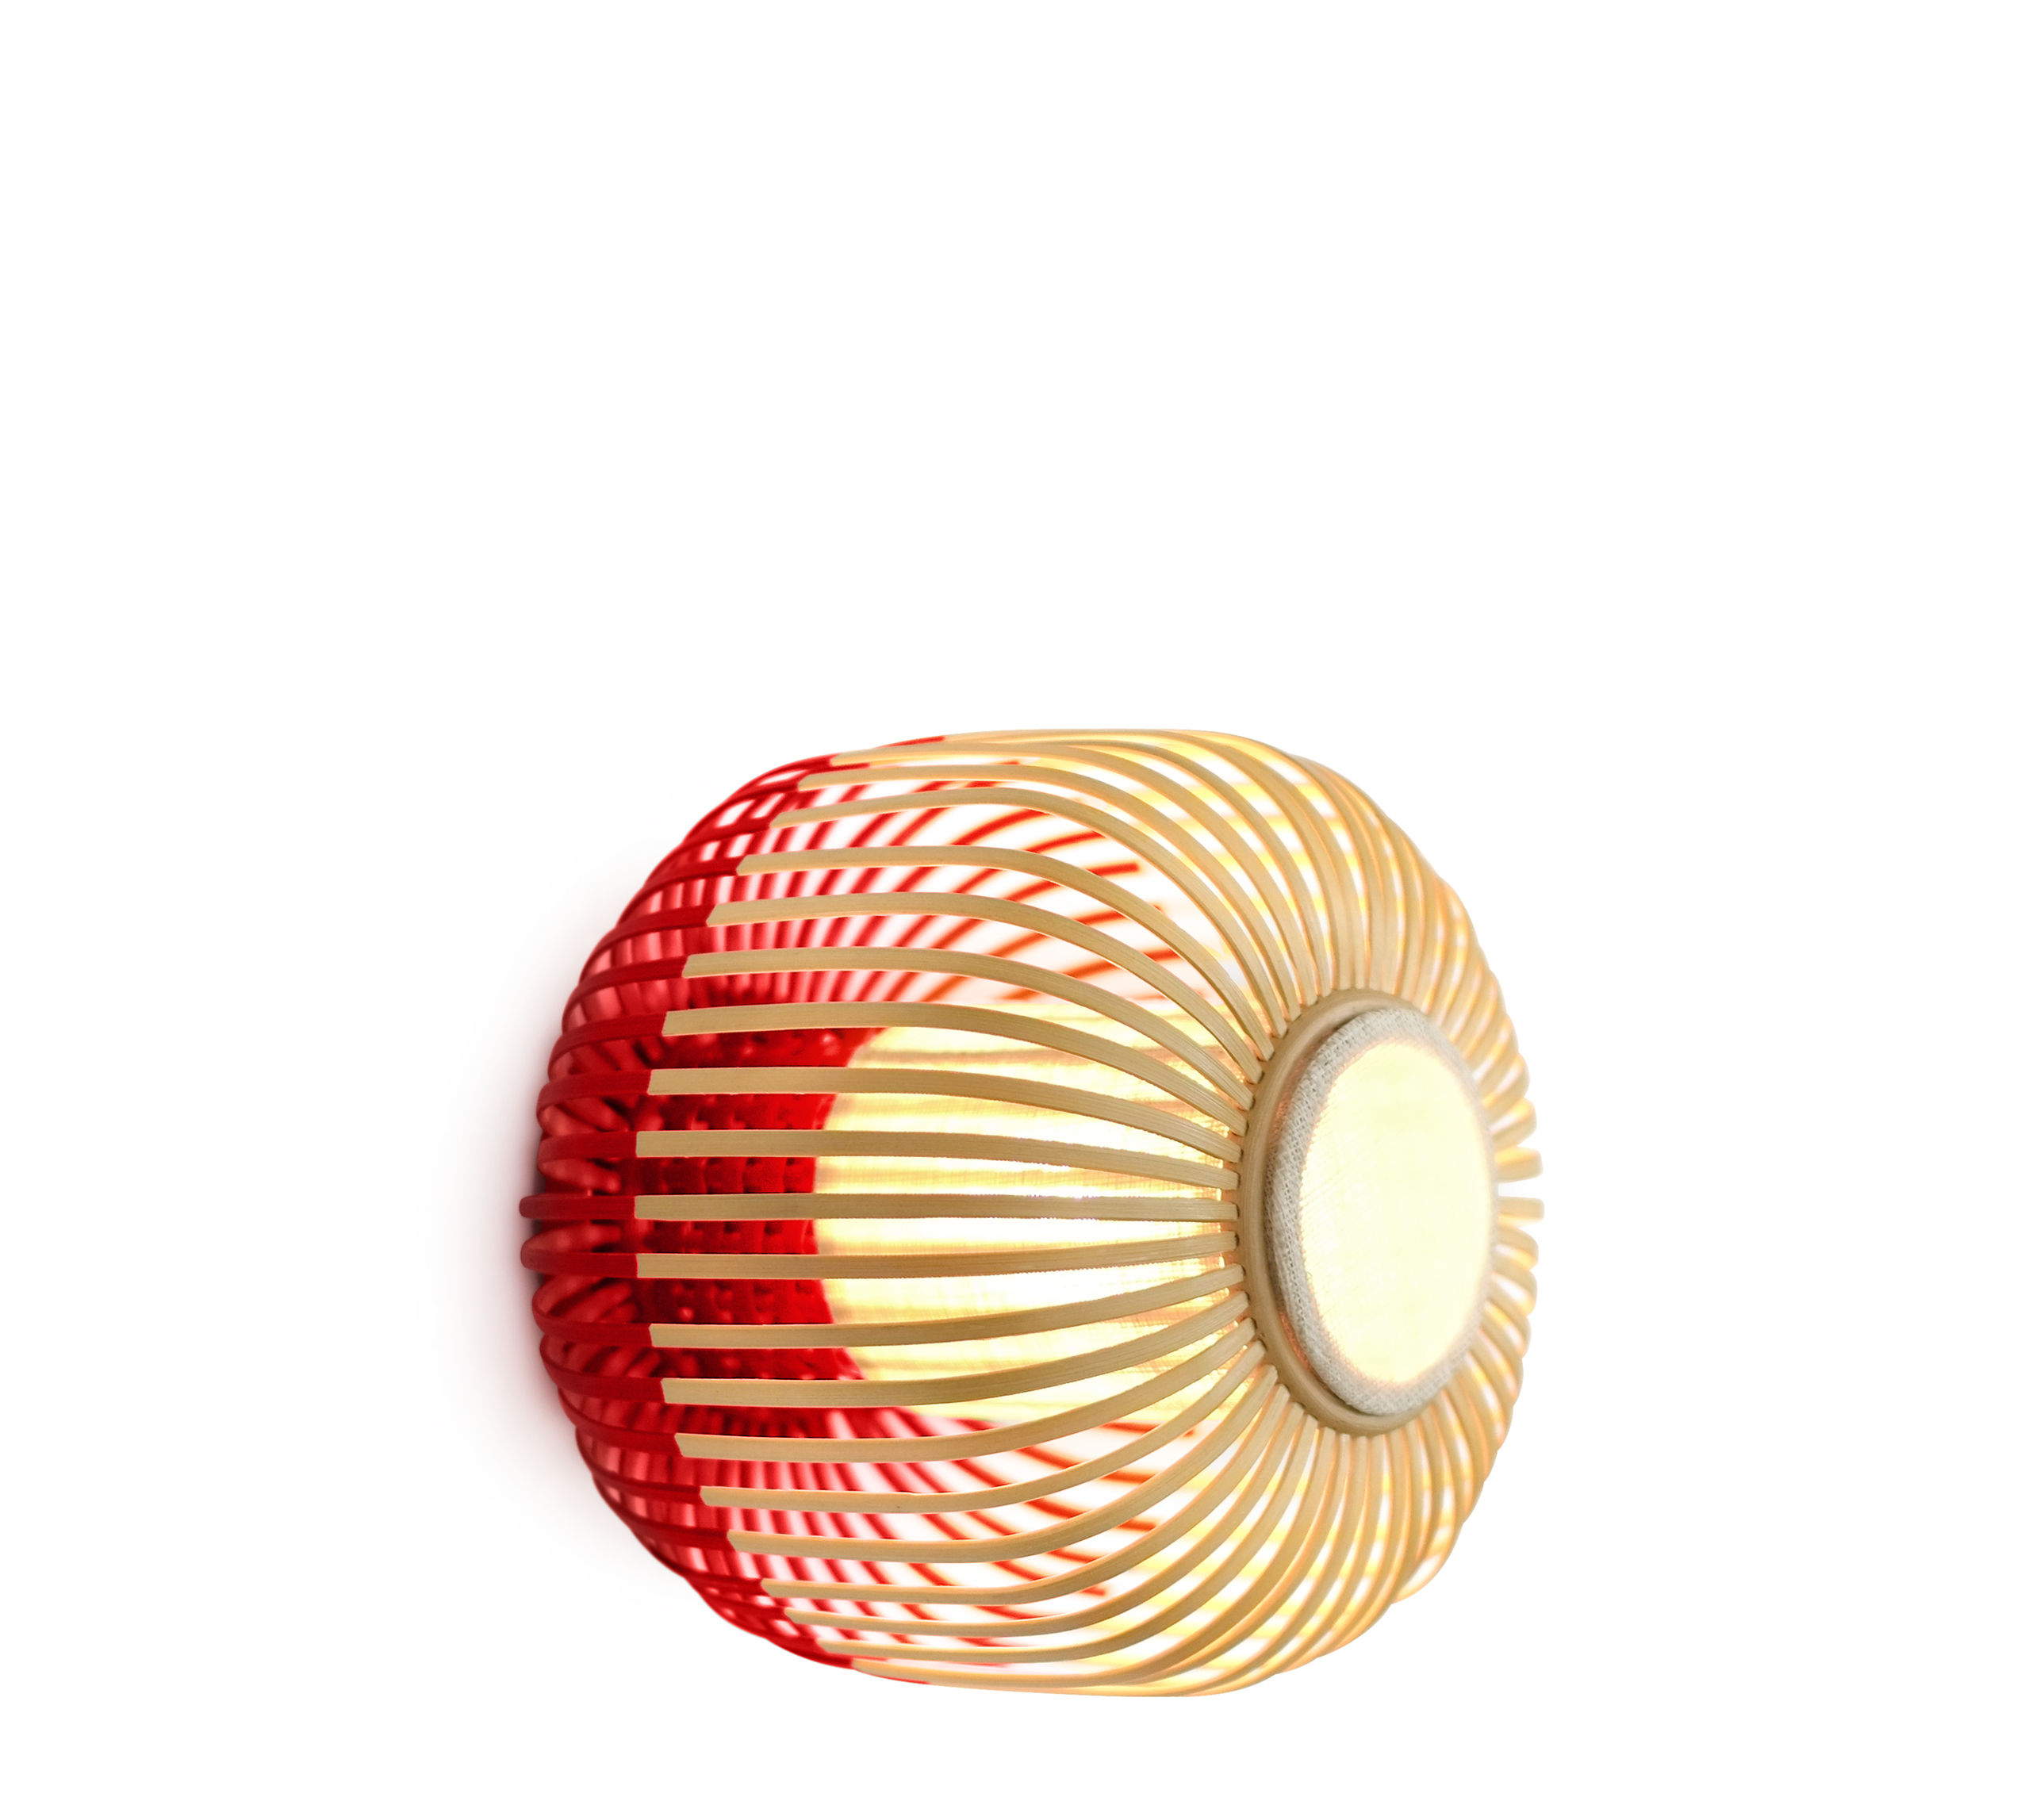 applique bamboo light xs plafonnier 27 x h 20 cm rouge naturel forestier. Black Bedroom Furniture Sets. Home Design Ideas